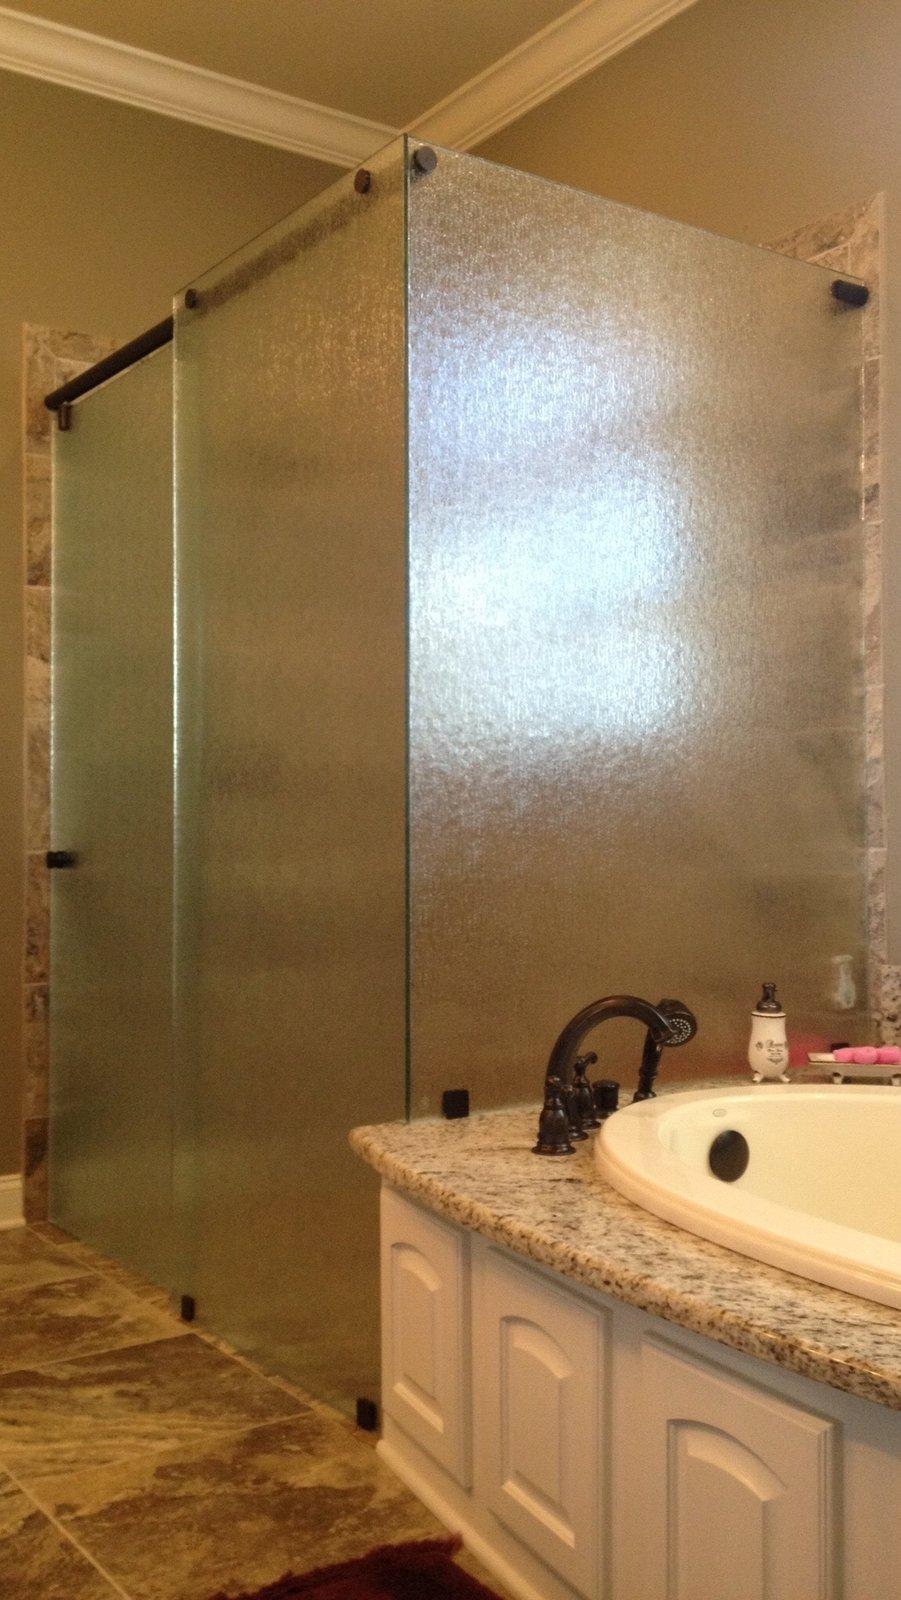 from Sliding Shower Doors - Dwell